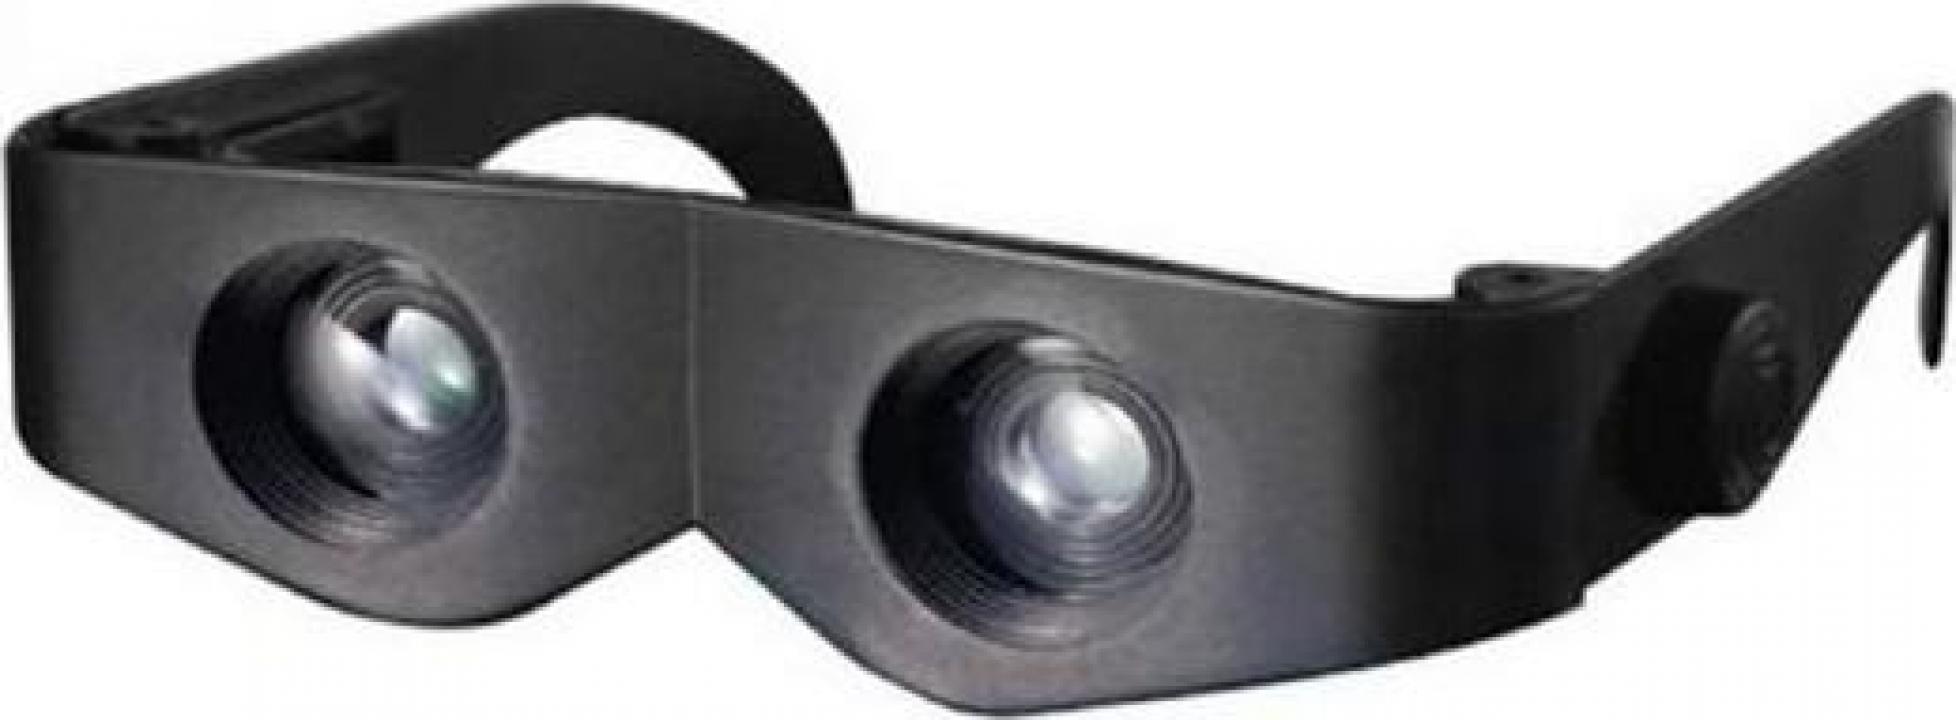 Ochelari binoclu cu zoom reglabil, Zoomies